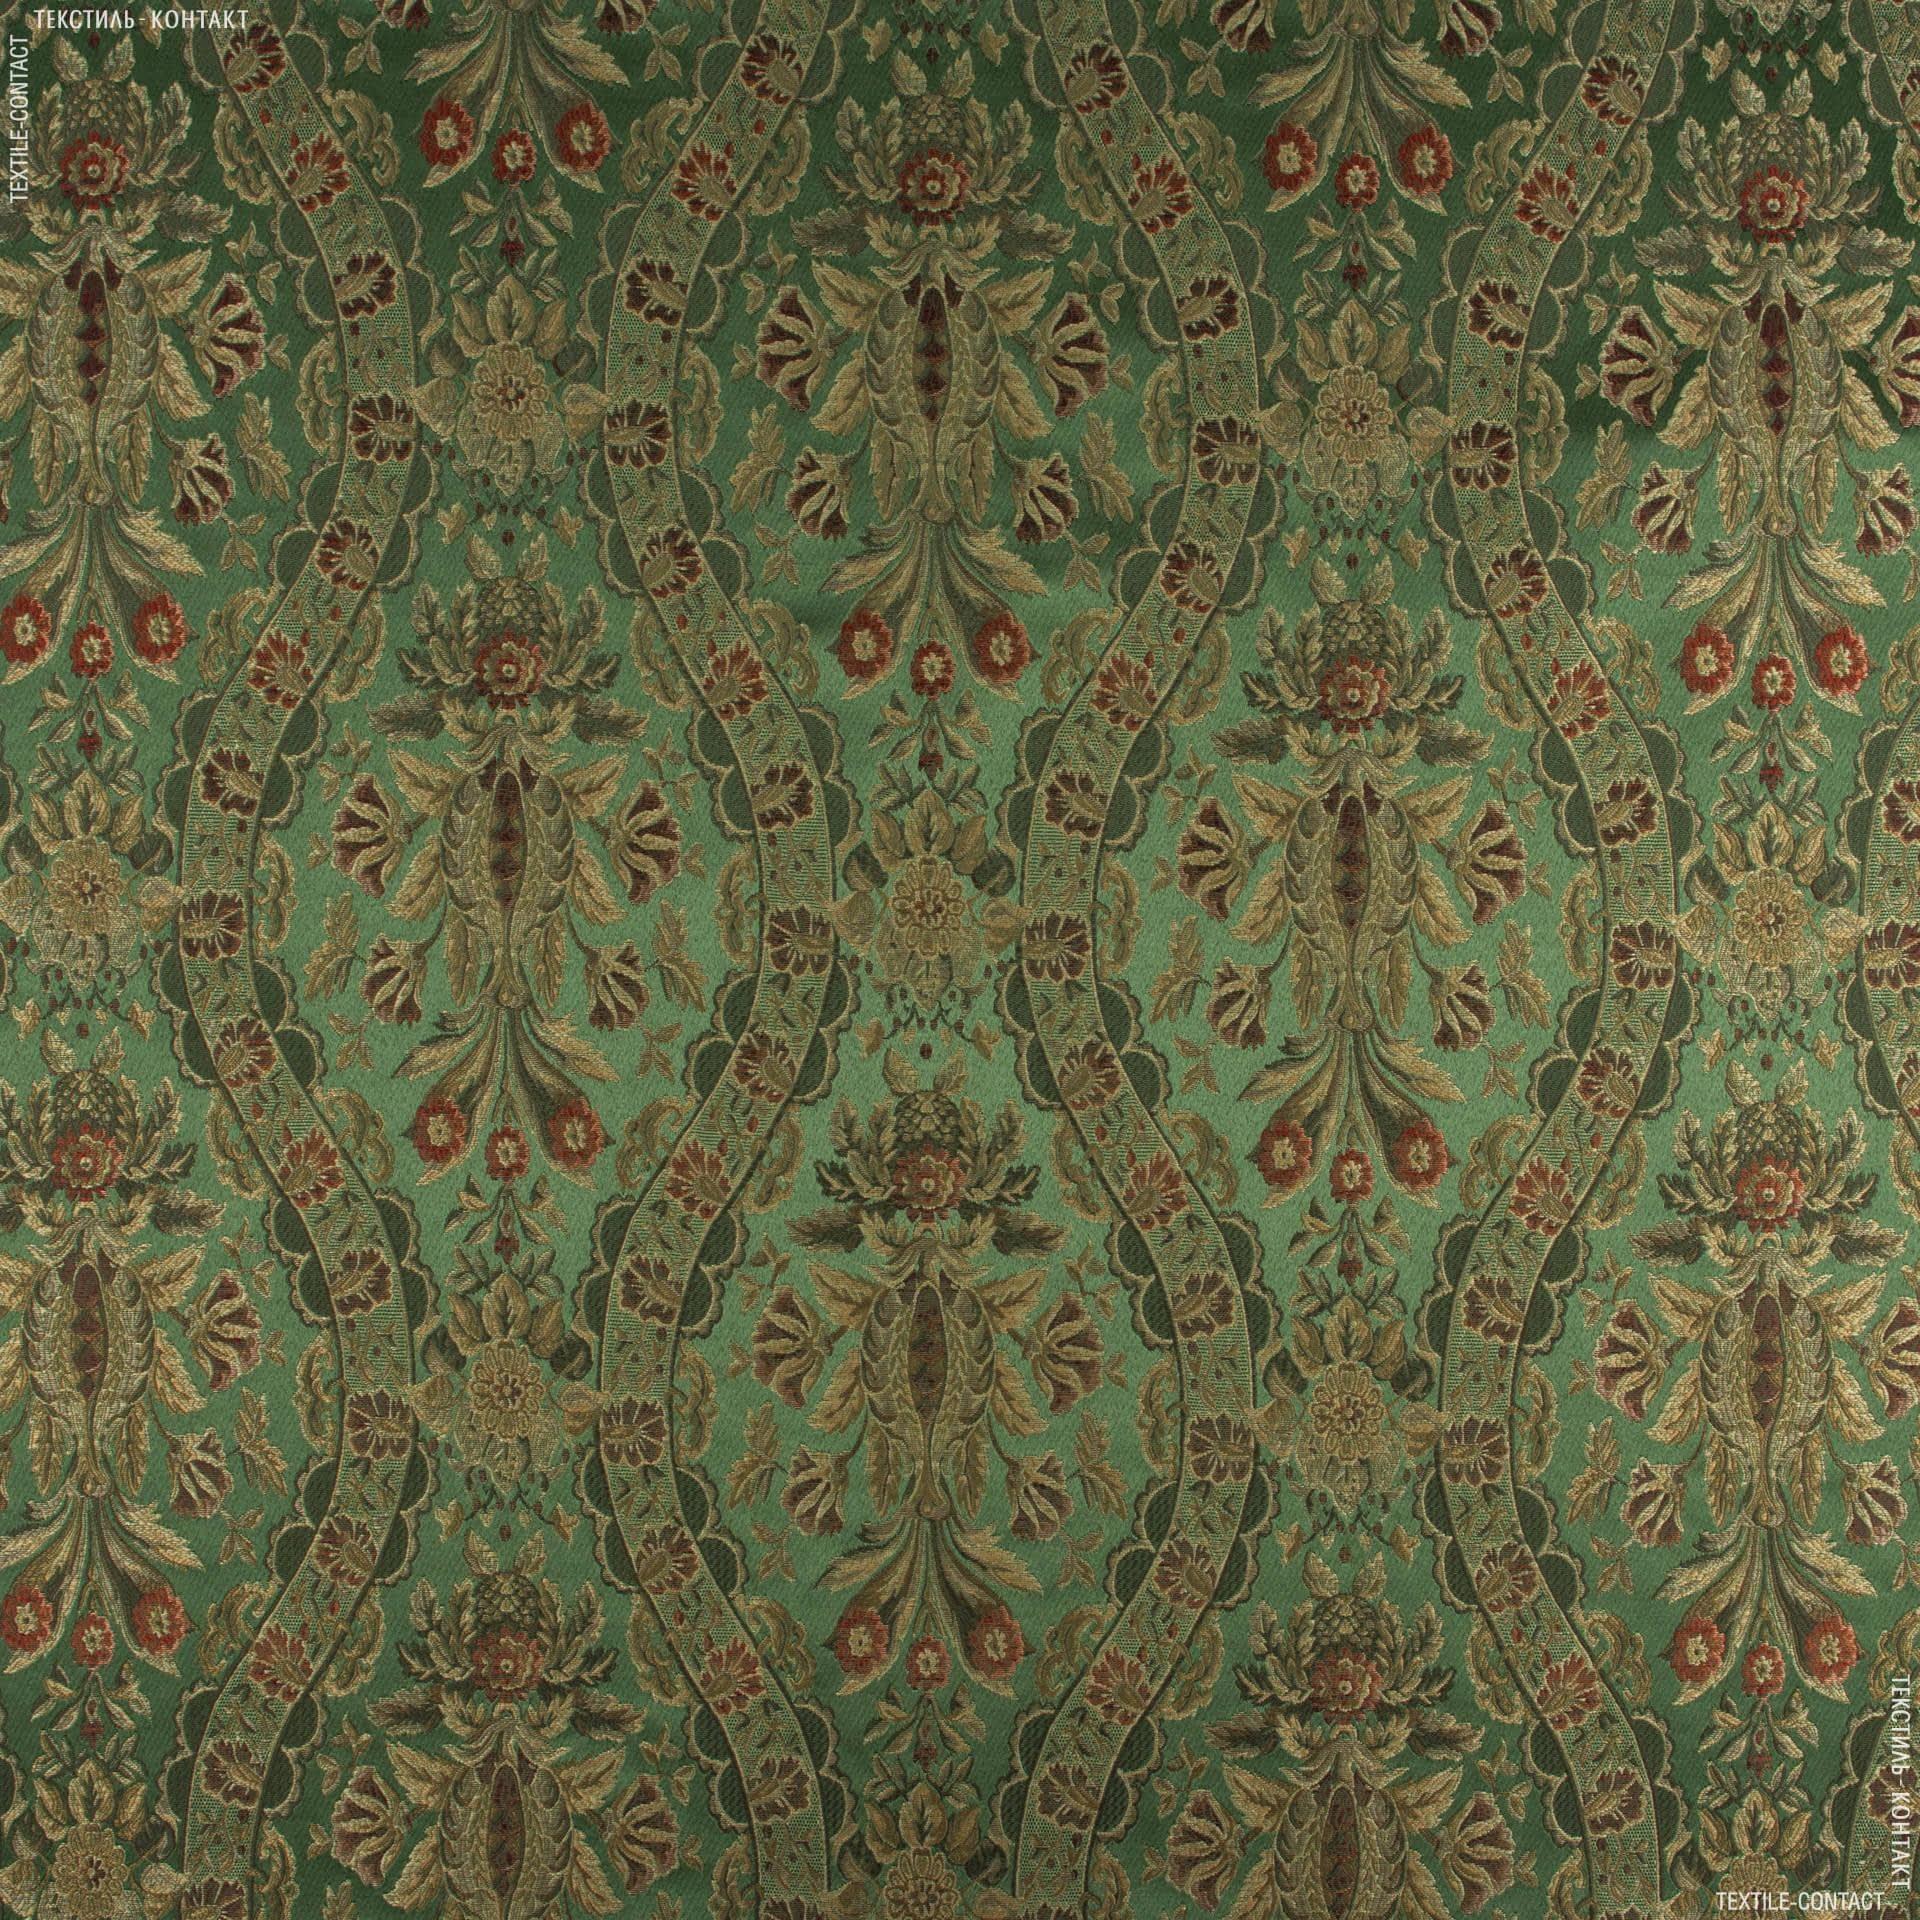 Ткани для портьер - Декор Мадрид оливка